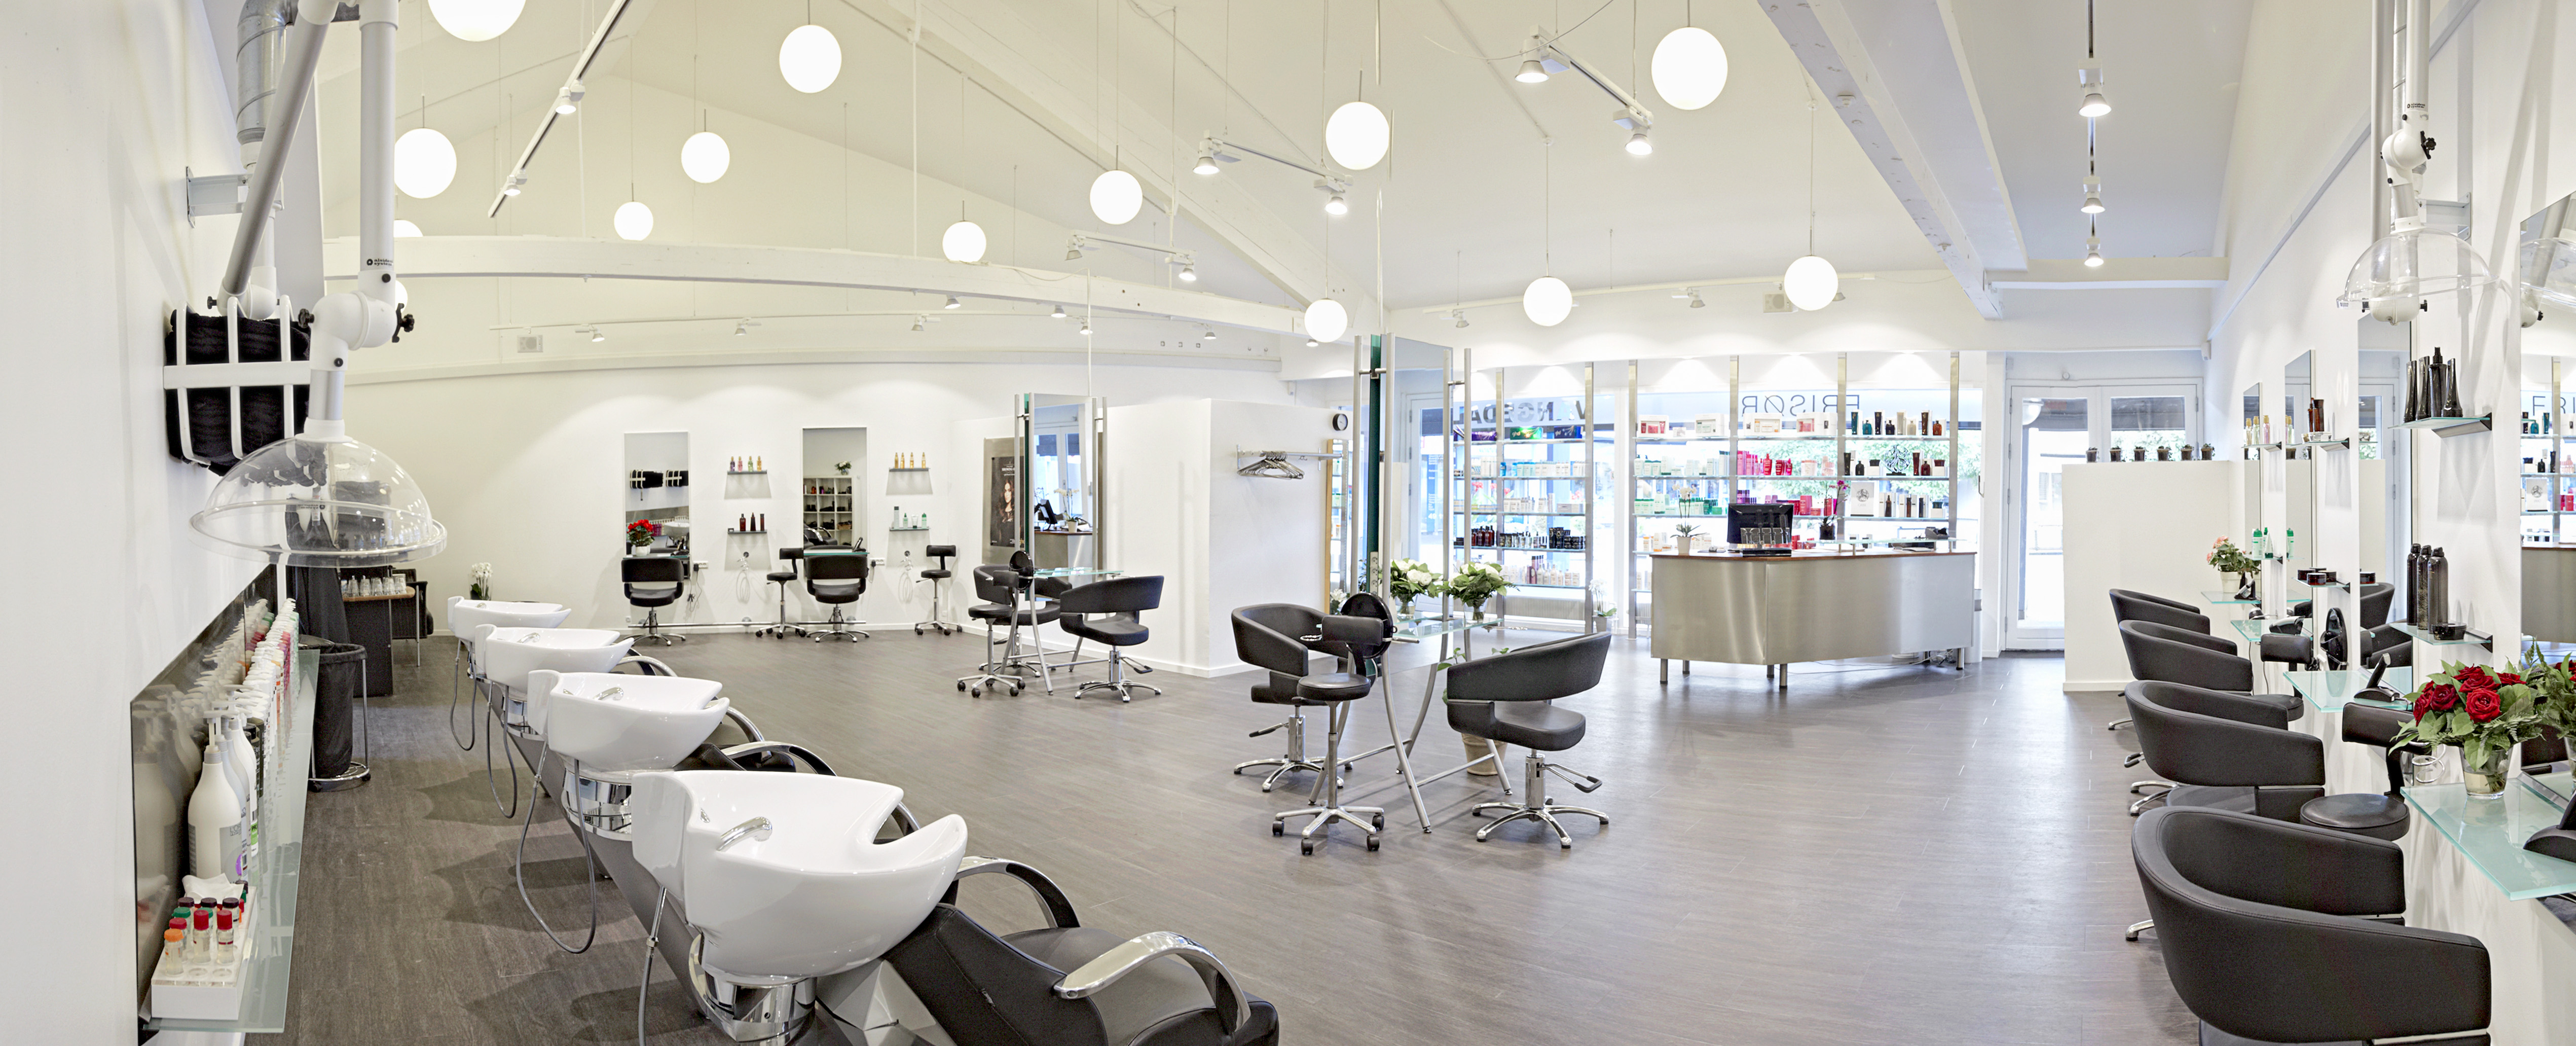 frisør saloner